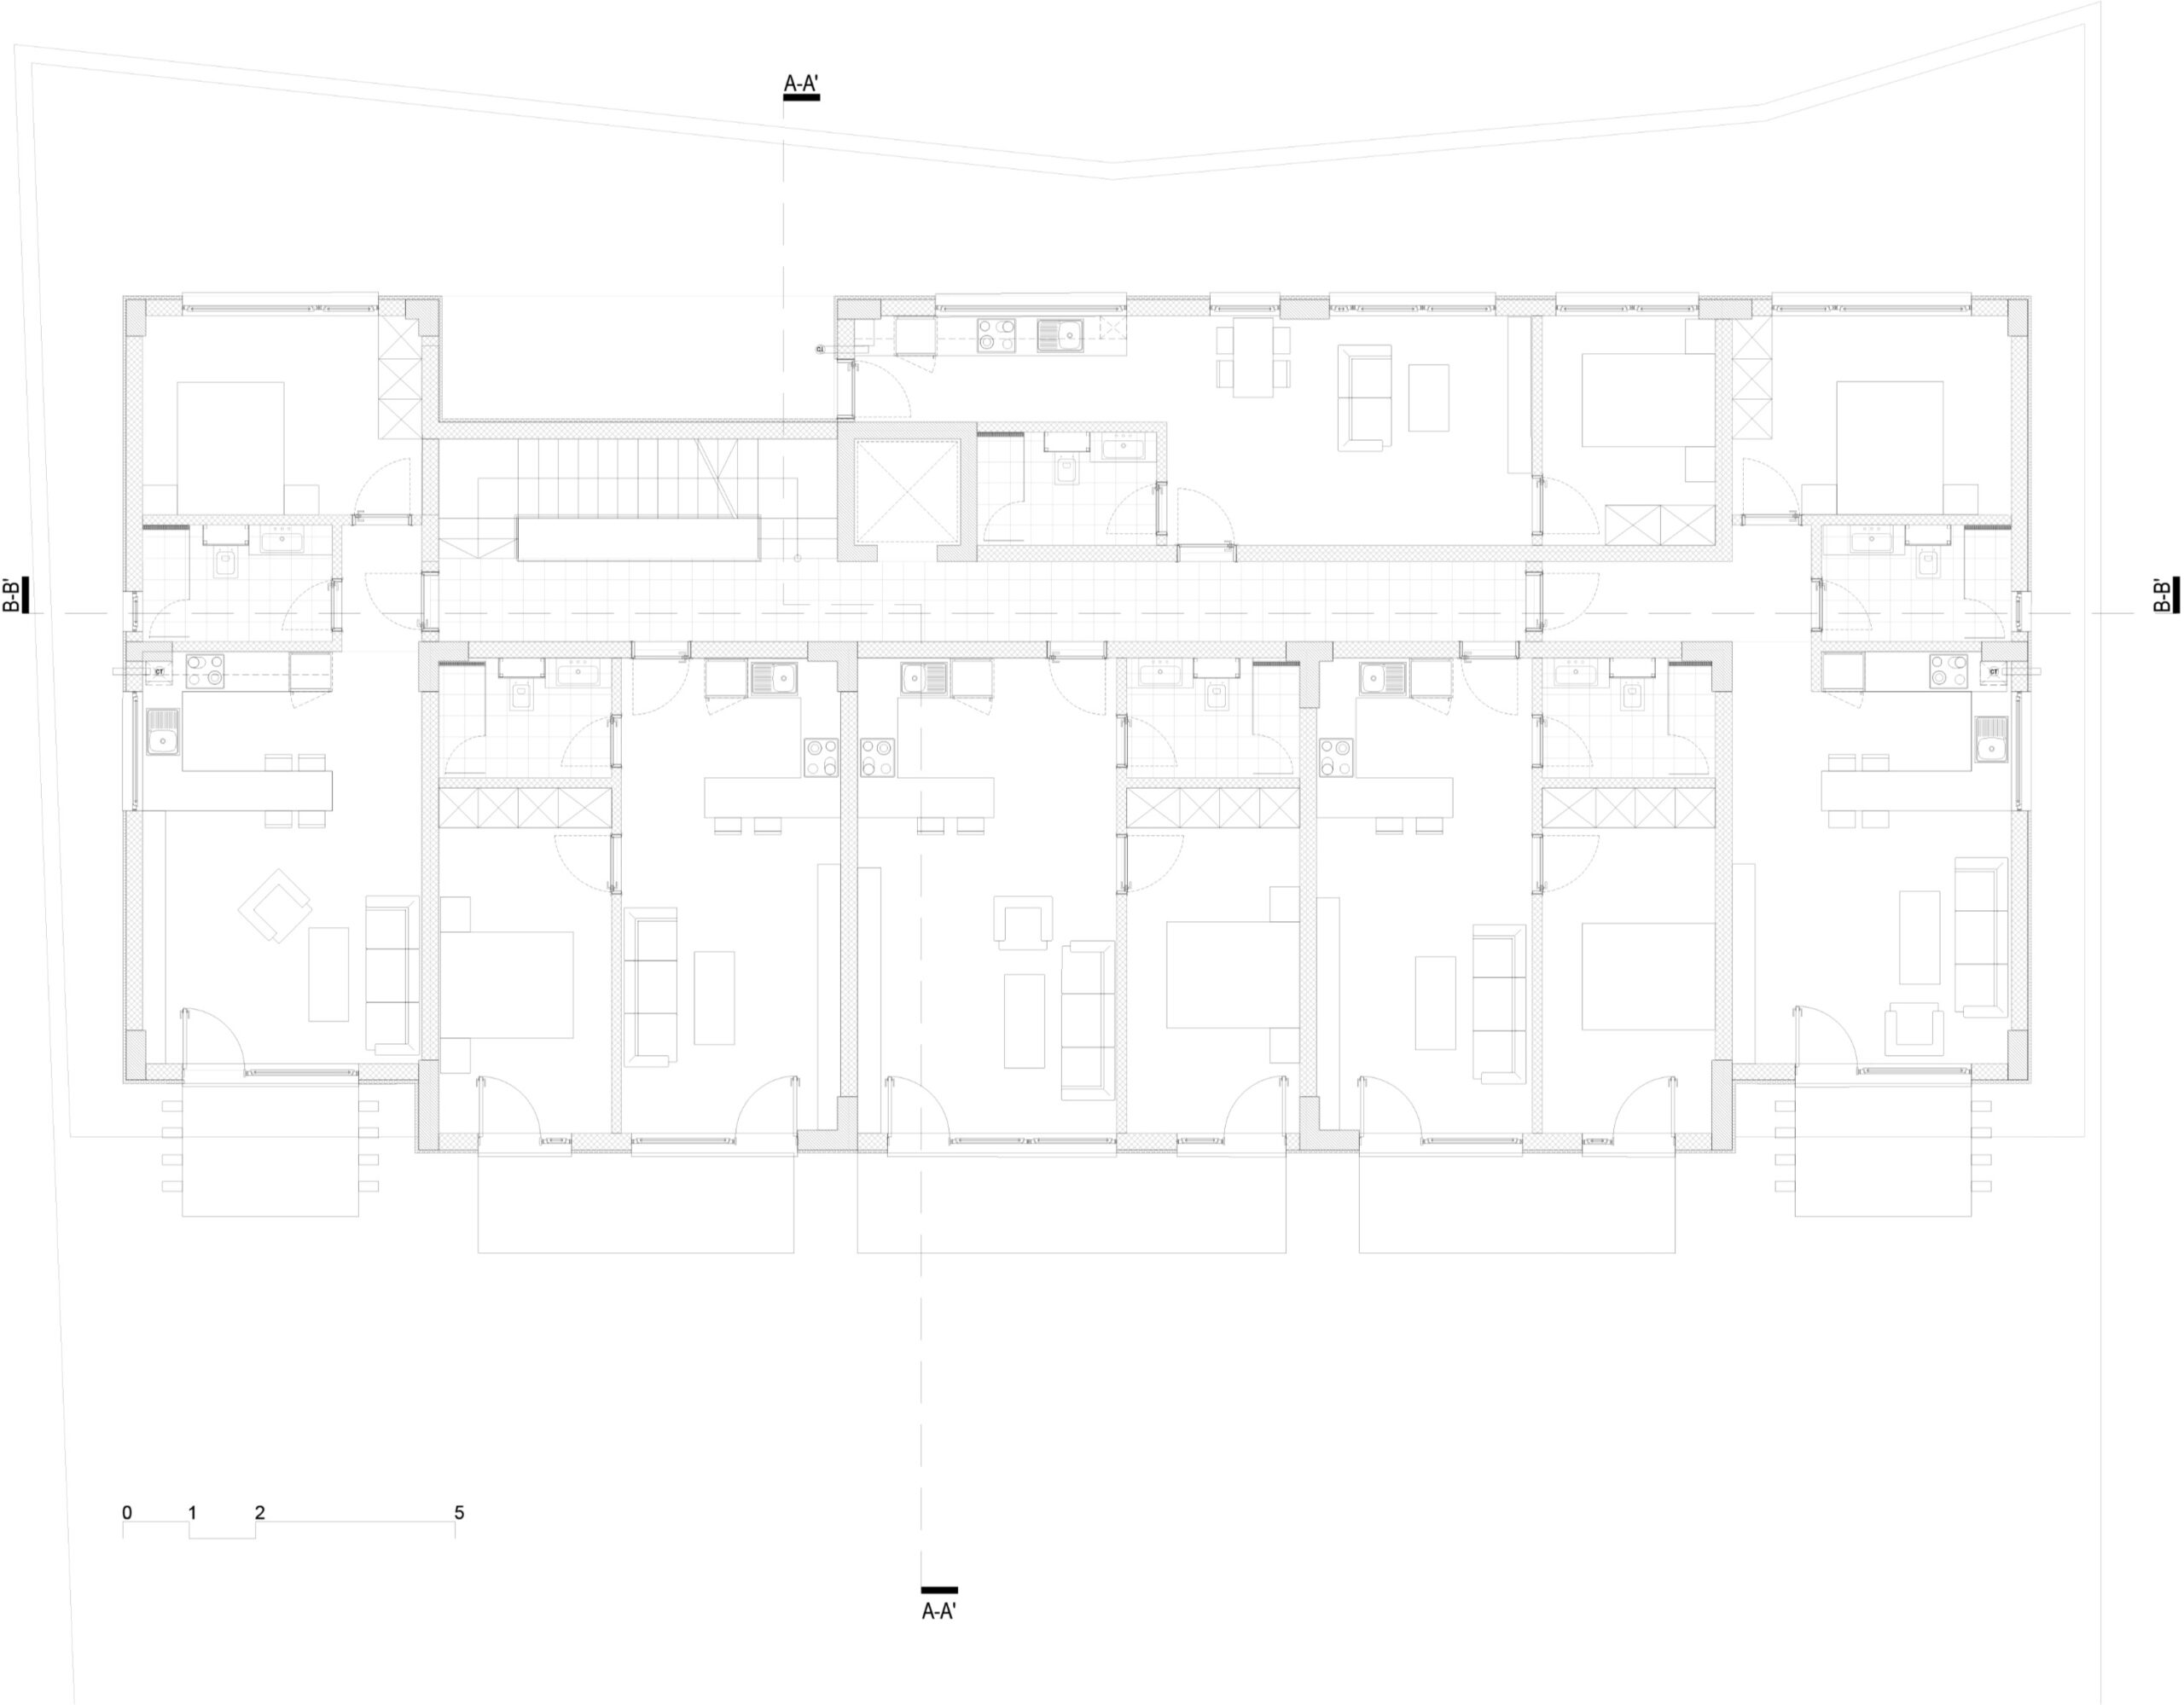 Plan etaj 1, 2, 3 și 4